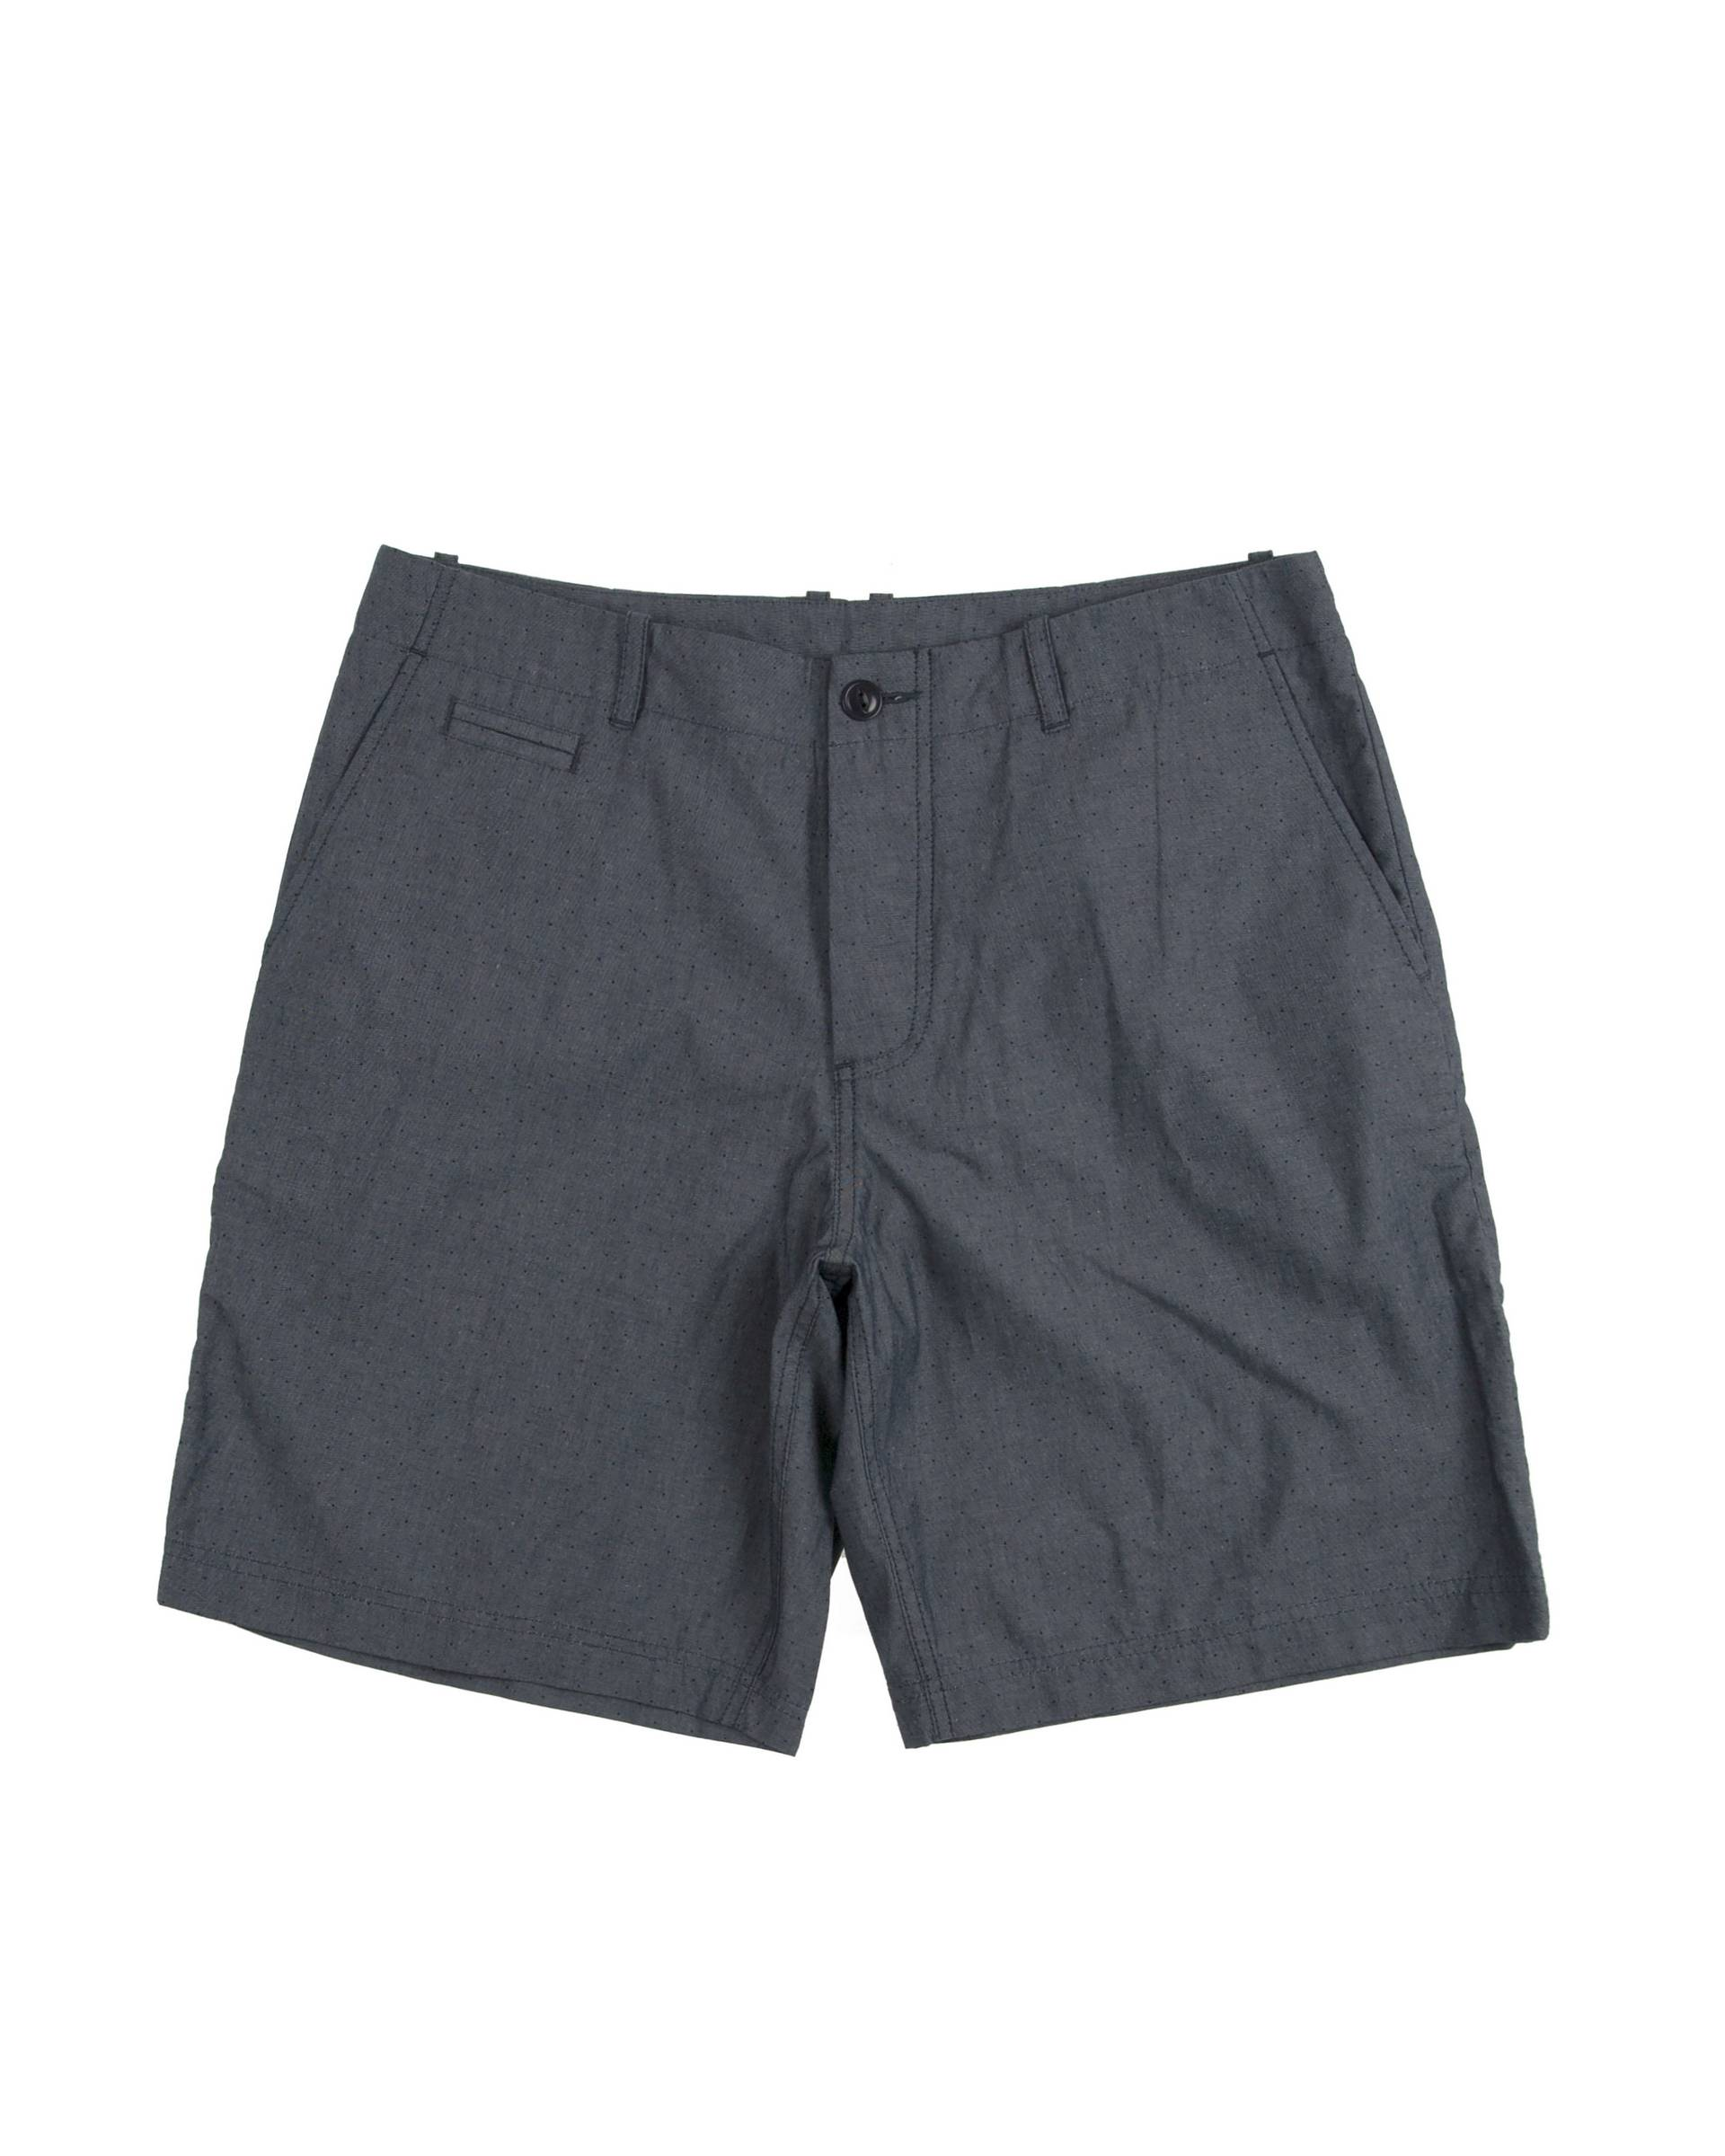 Шорты Fred Perry Tennis Polka Dot Grey Shorts